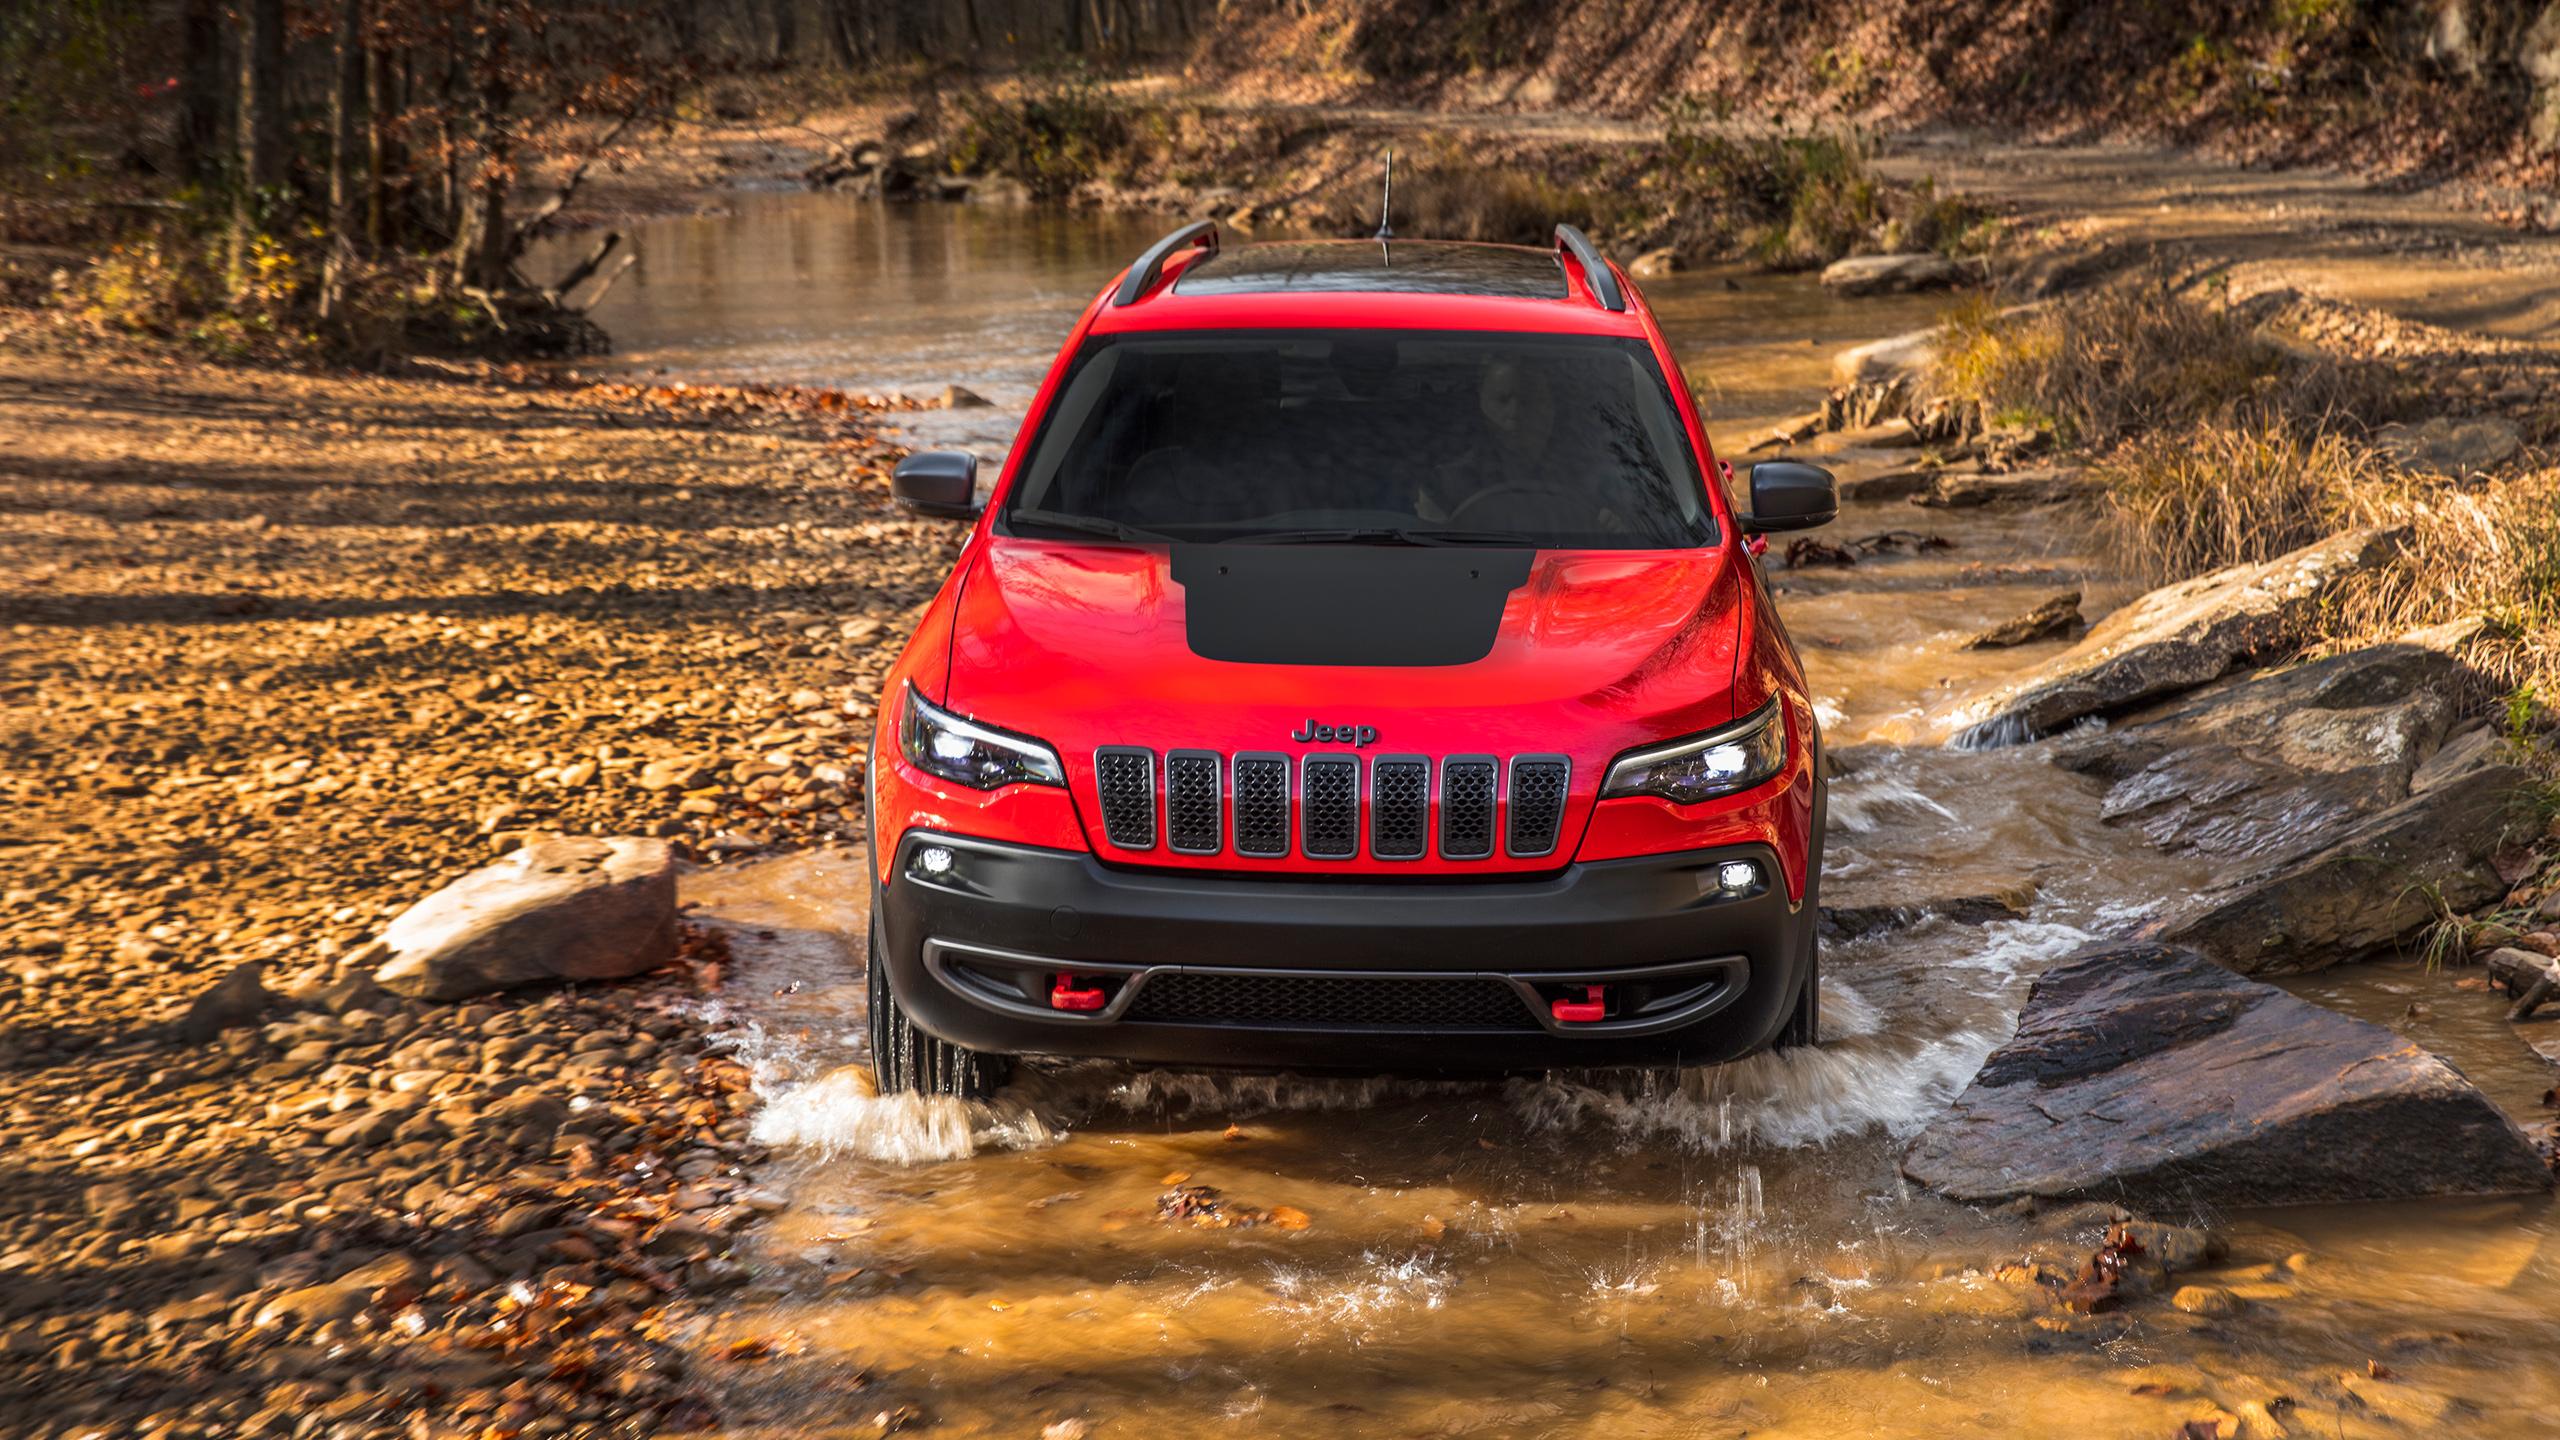 2019 Jeep Cherokee Trailhawk 3 Wallpaper   HD Car ...